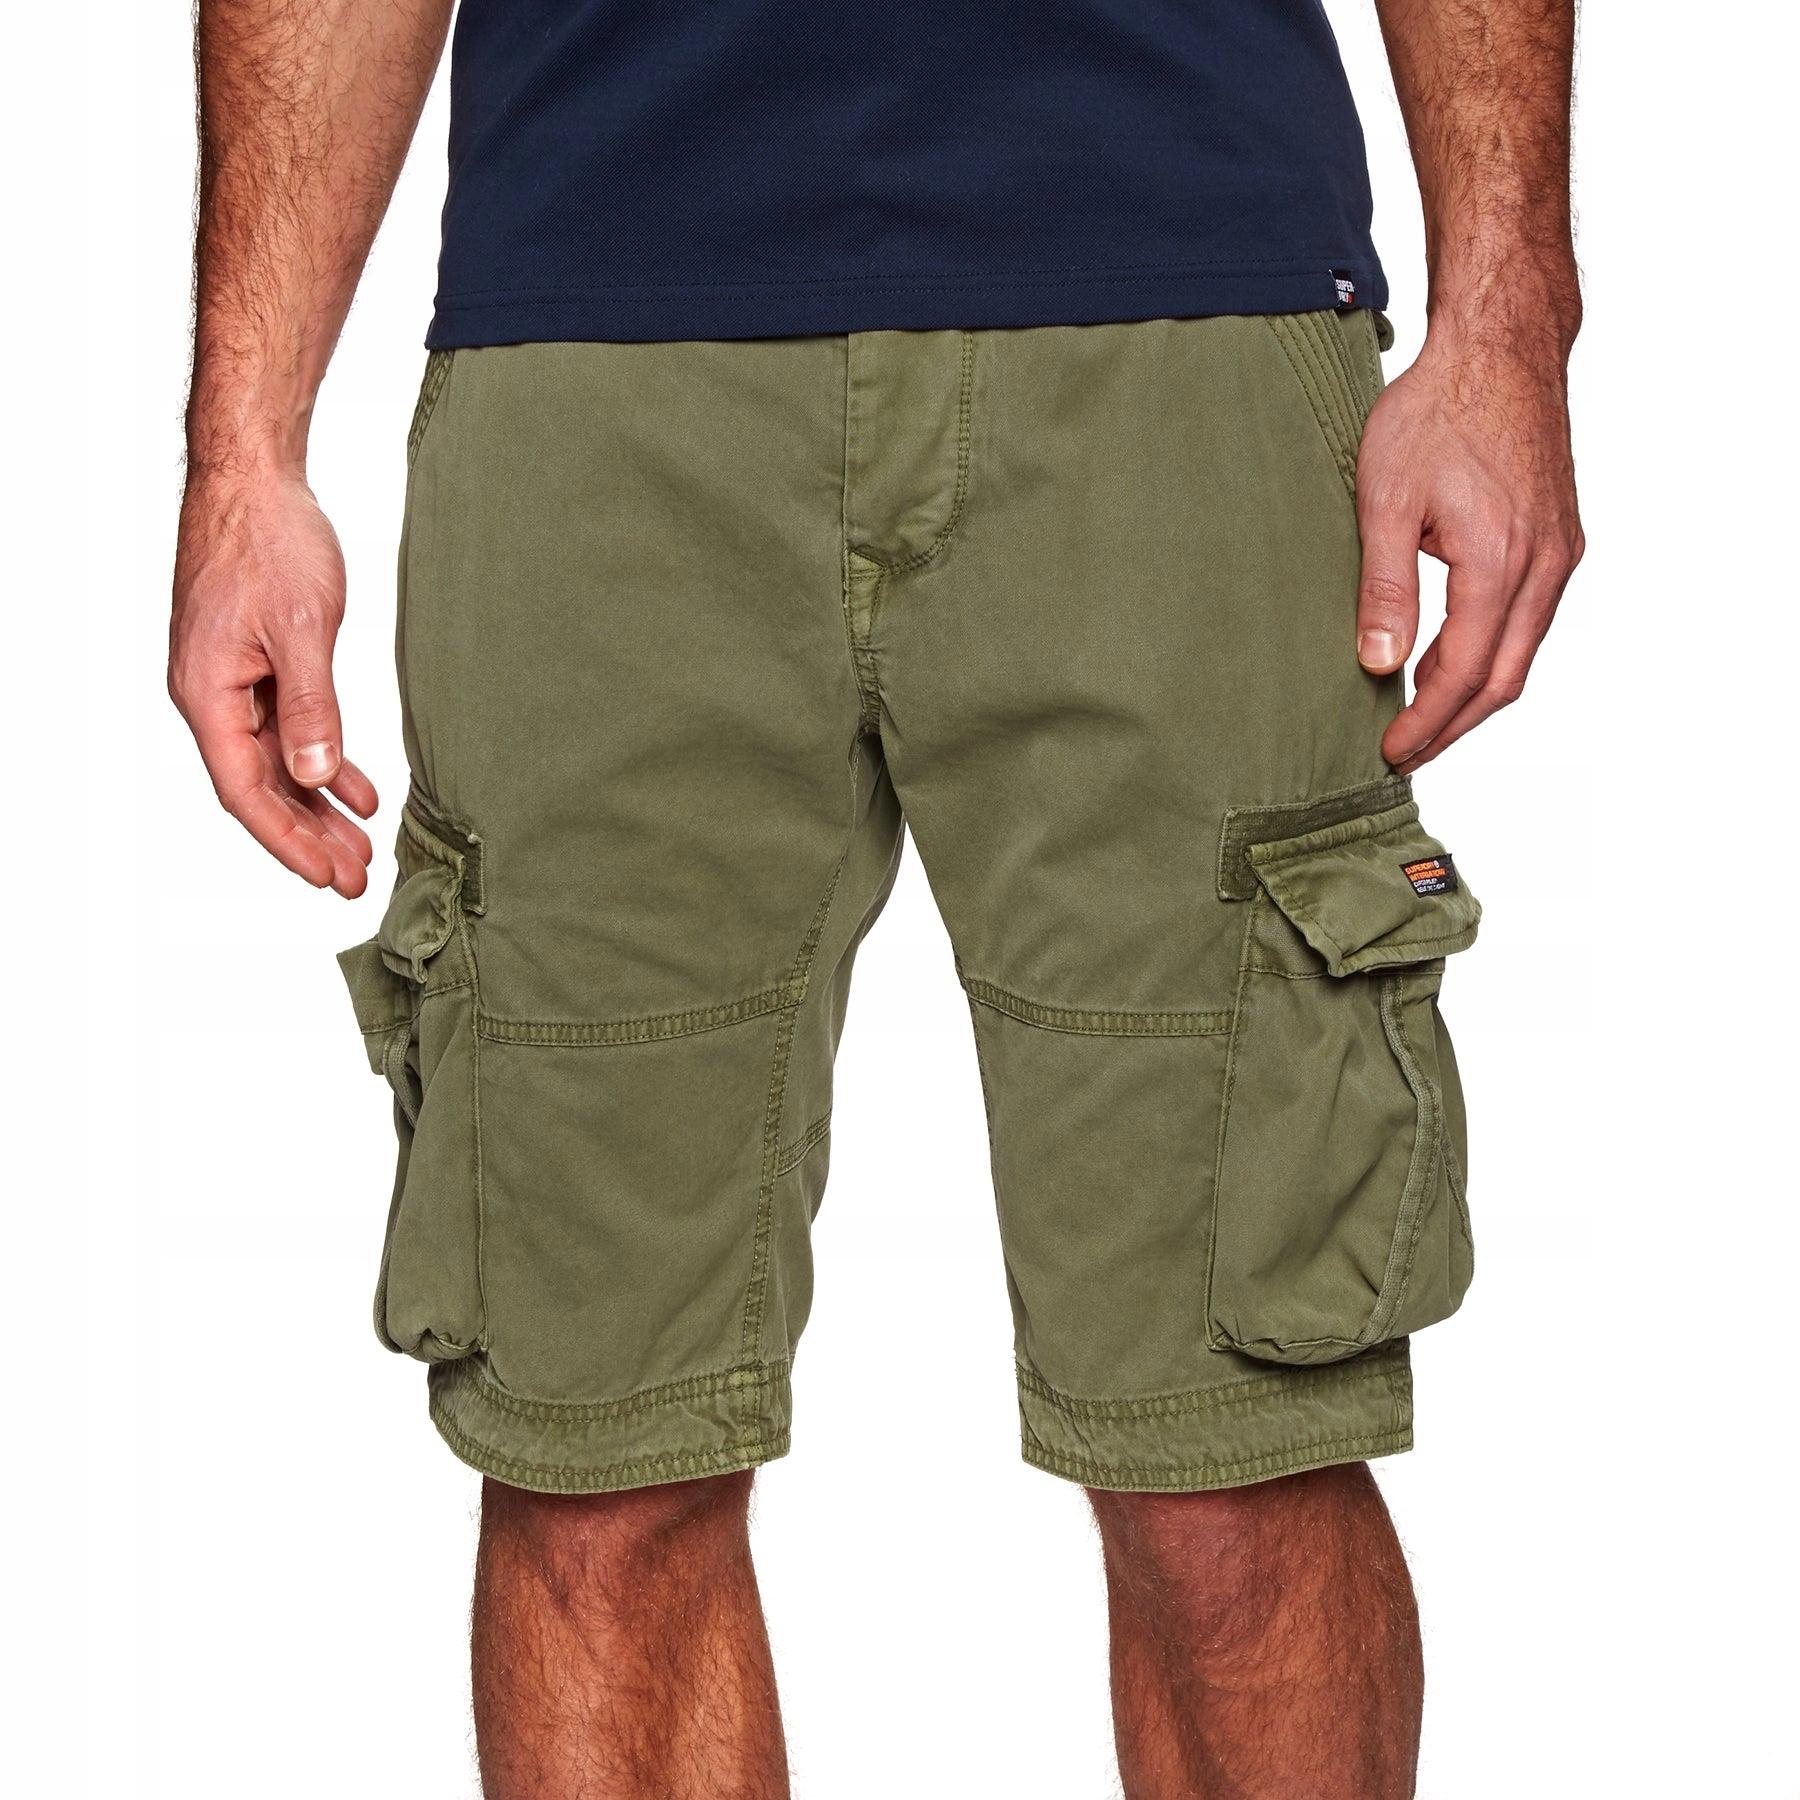 Spodenki SUPERDRY cargo XL casual short khaki